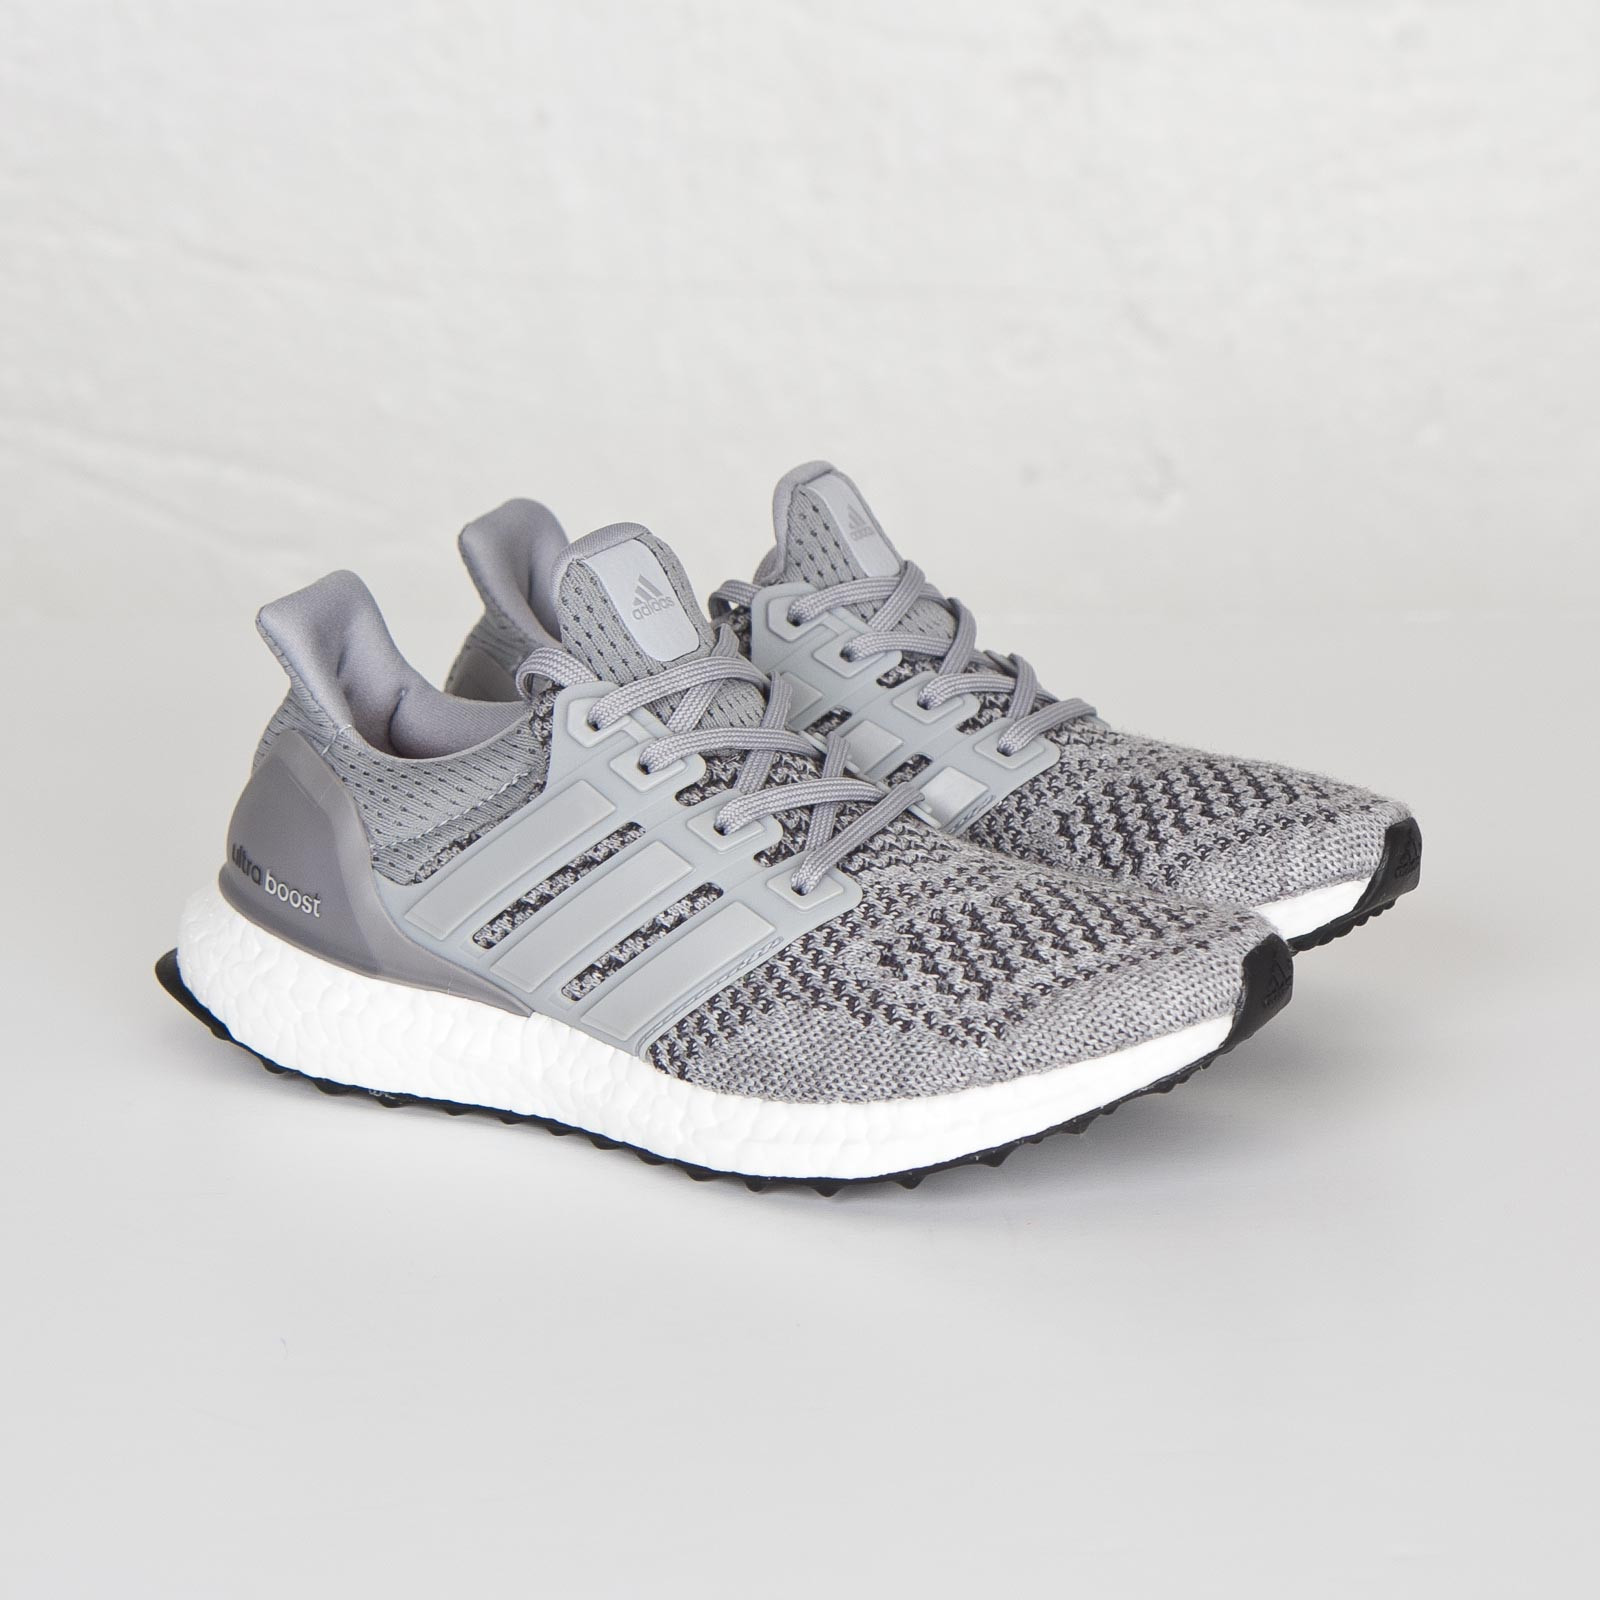 adidas Ultra Boost W S77515 Sneakersnstuff | sneakers